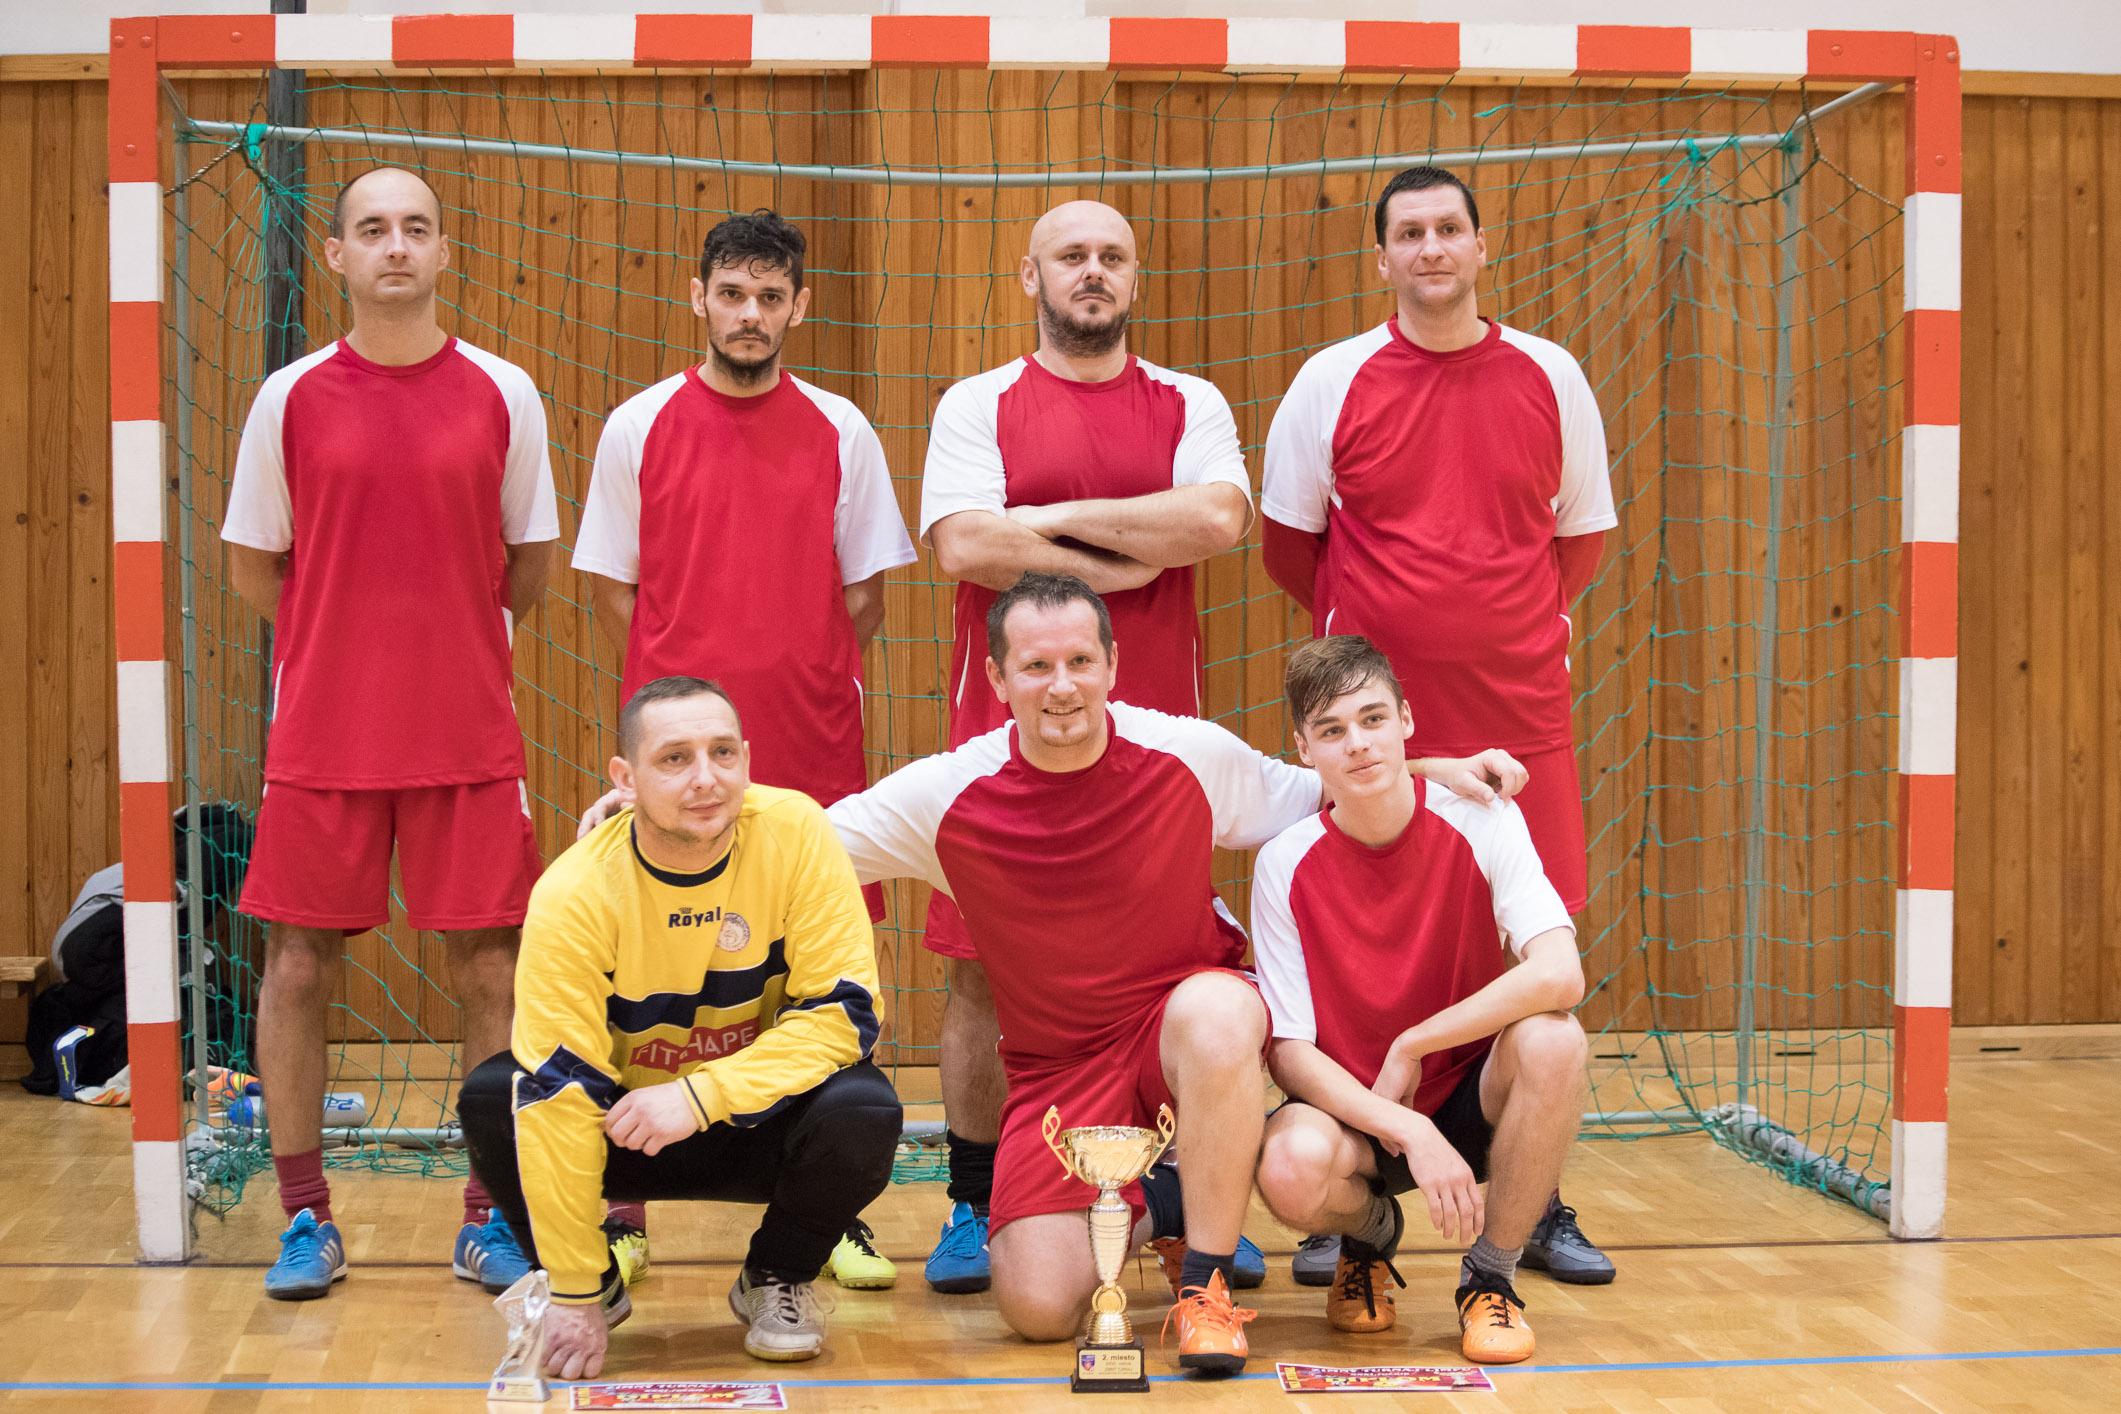 zimny-turnaj-limfu-zv-pianko-2